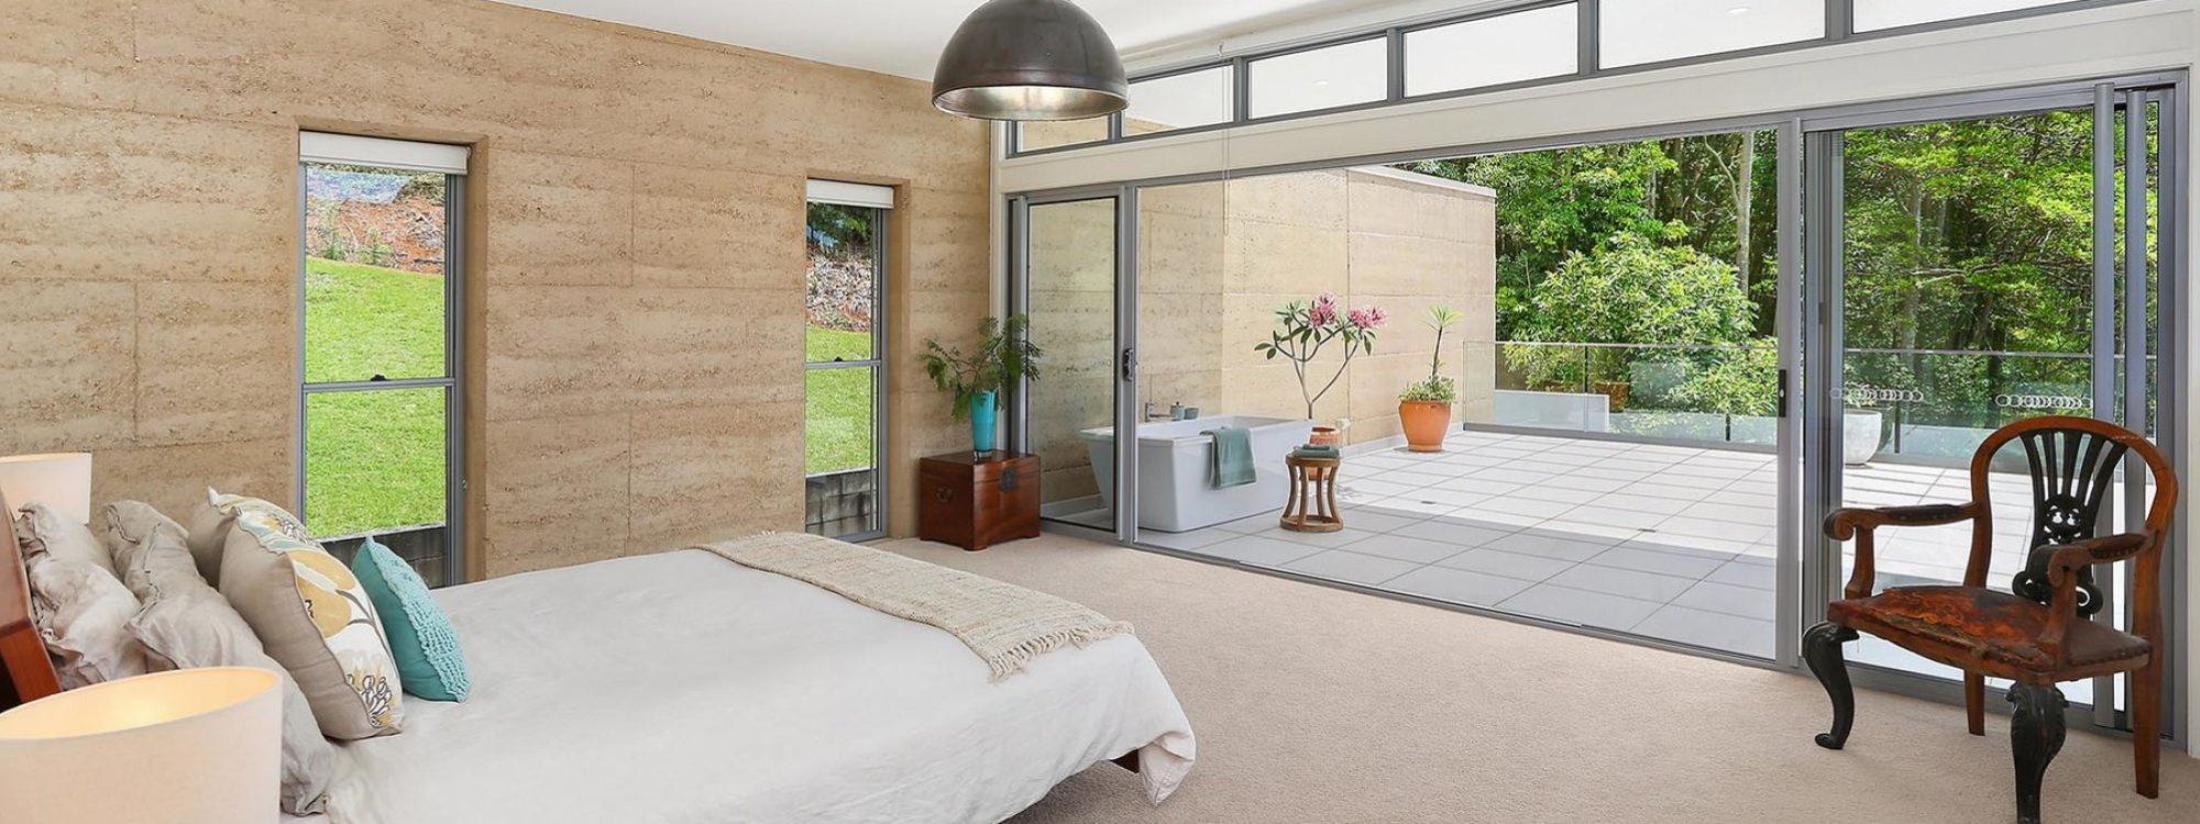 Currumbin Heights - Currumbin - Master Bedroom and Private Balcony b